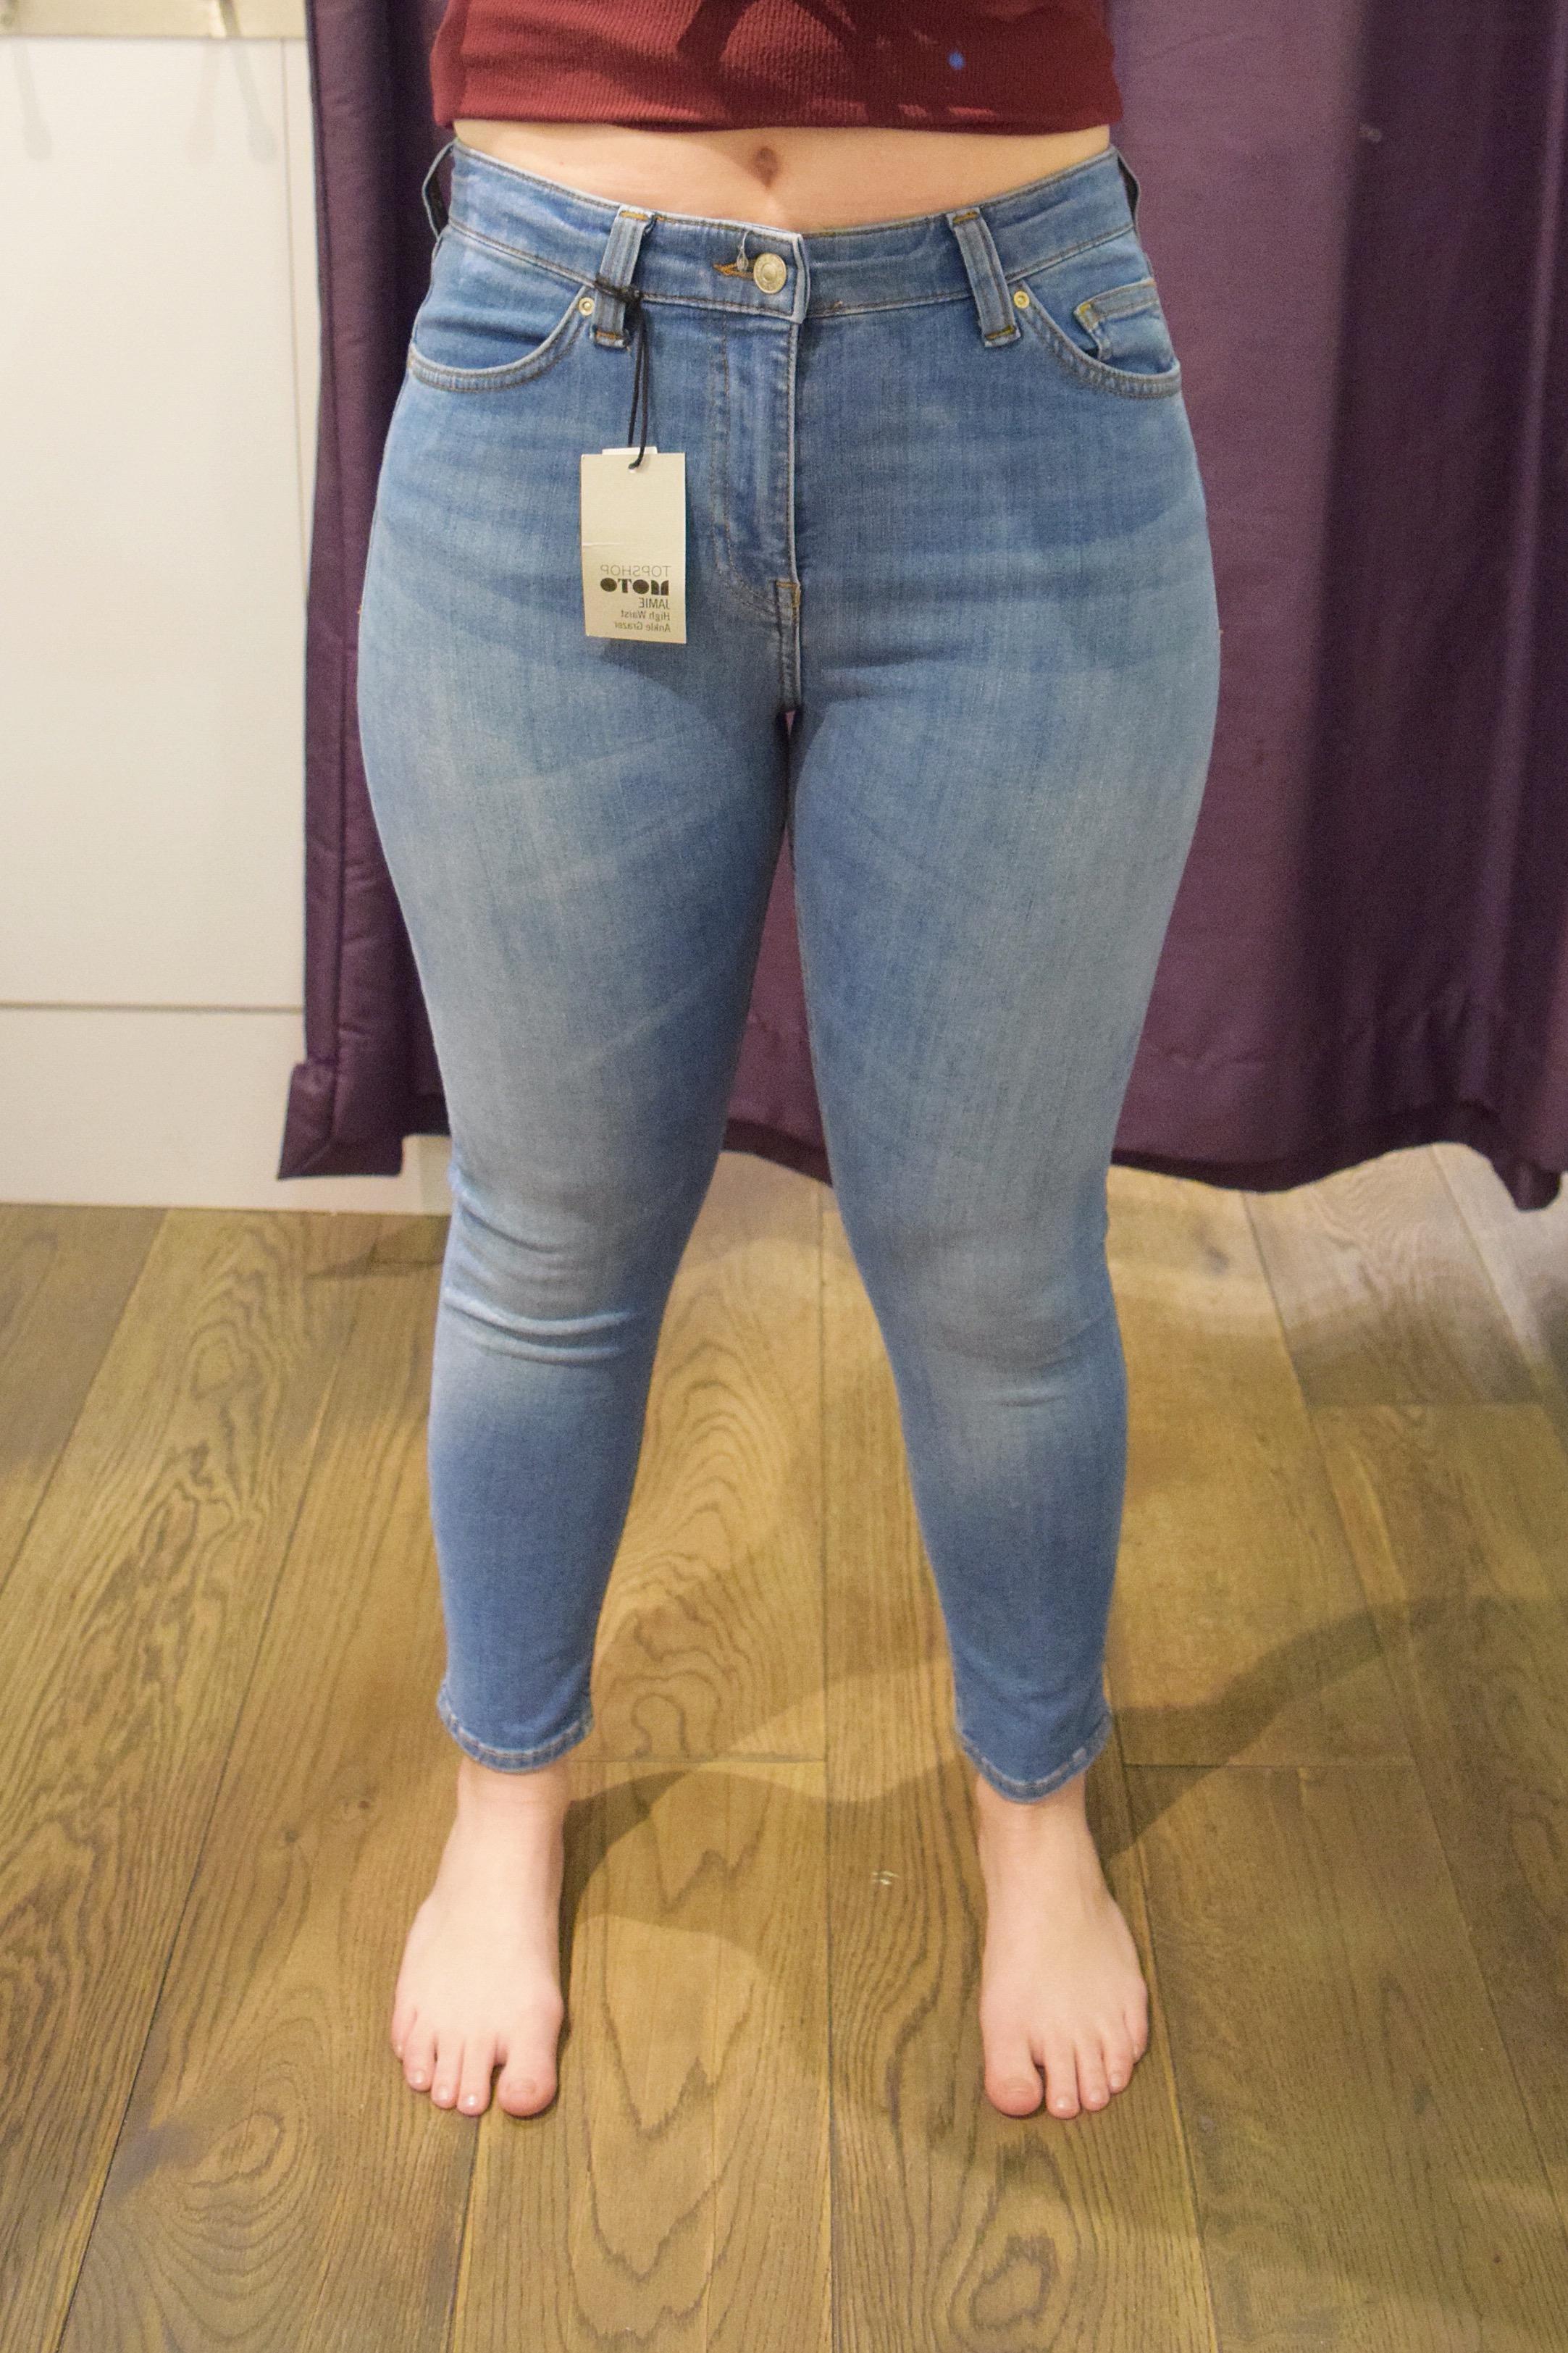 Topshop Petite Jamie High Waist Ankle Grazer - Size 6 Petite - Front View